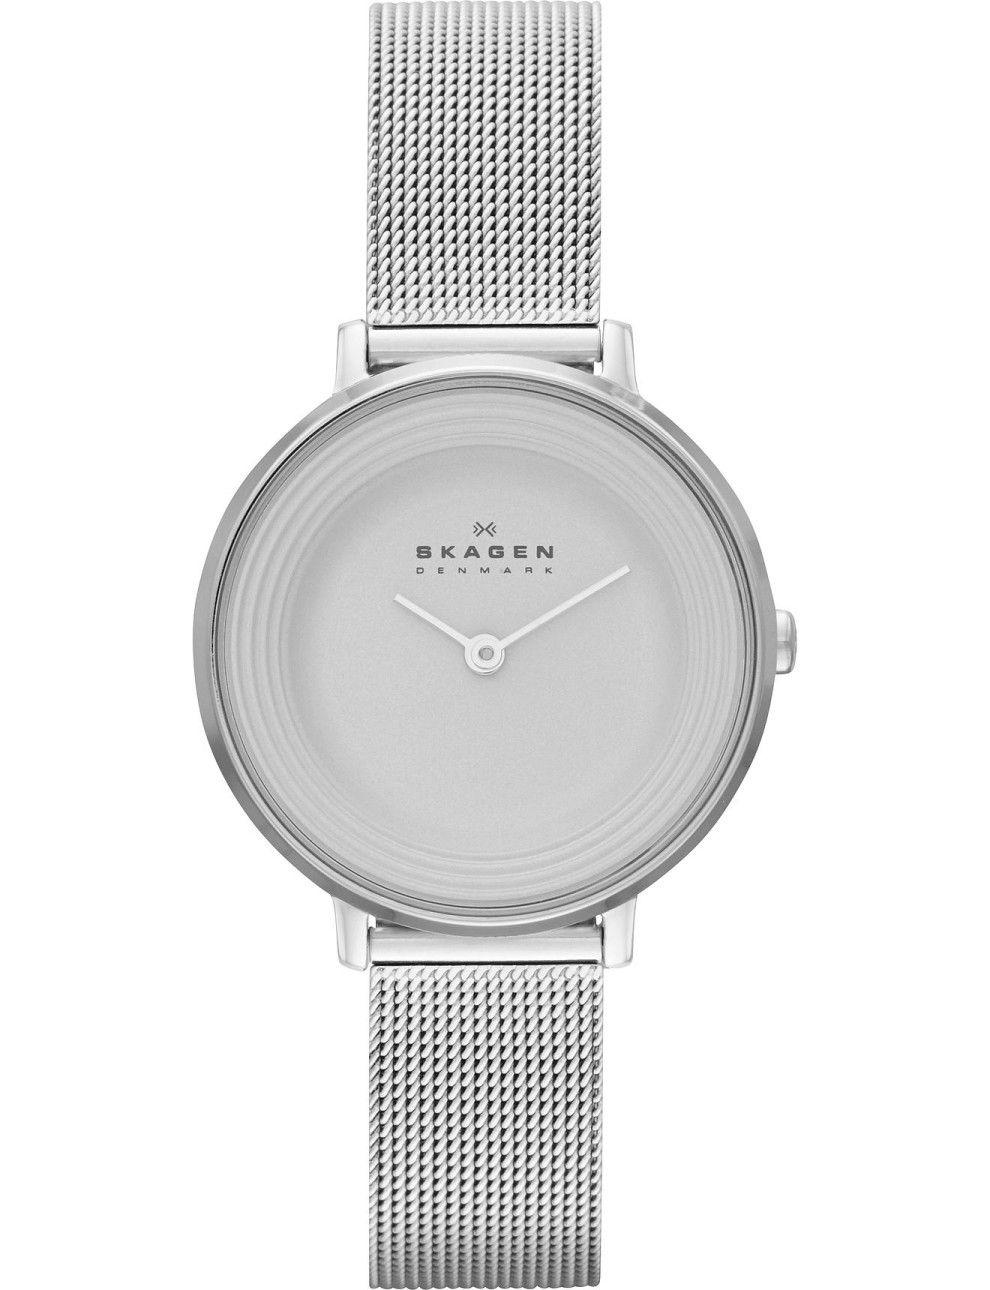 Skagen Watch - Ditte   David Jones bought it ♡   moodbord my style ... 6b7bf02b82